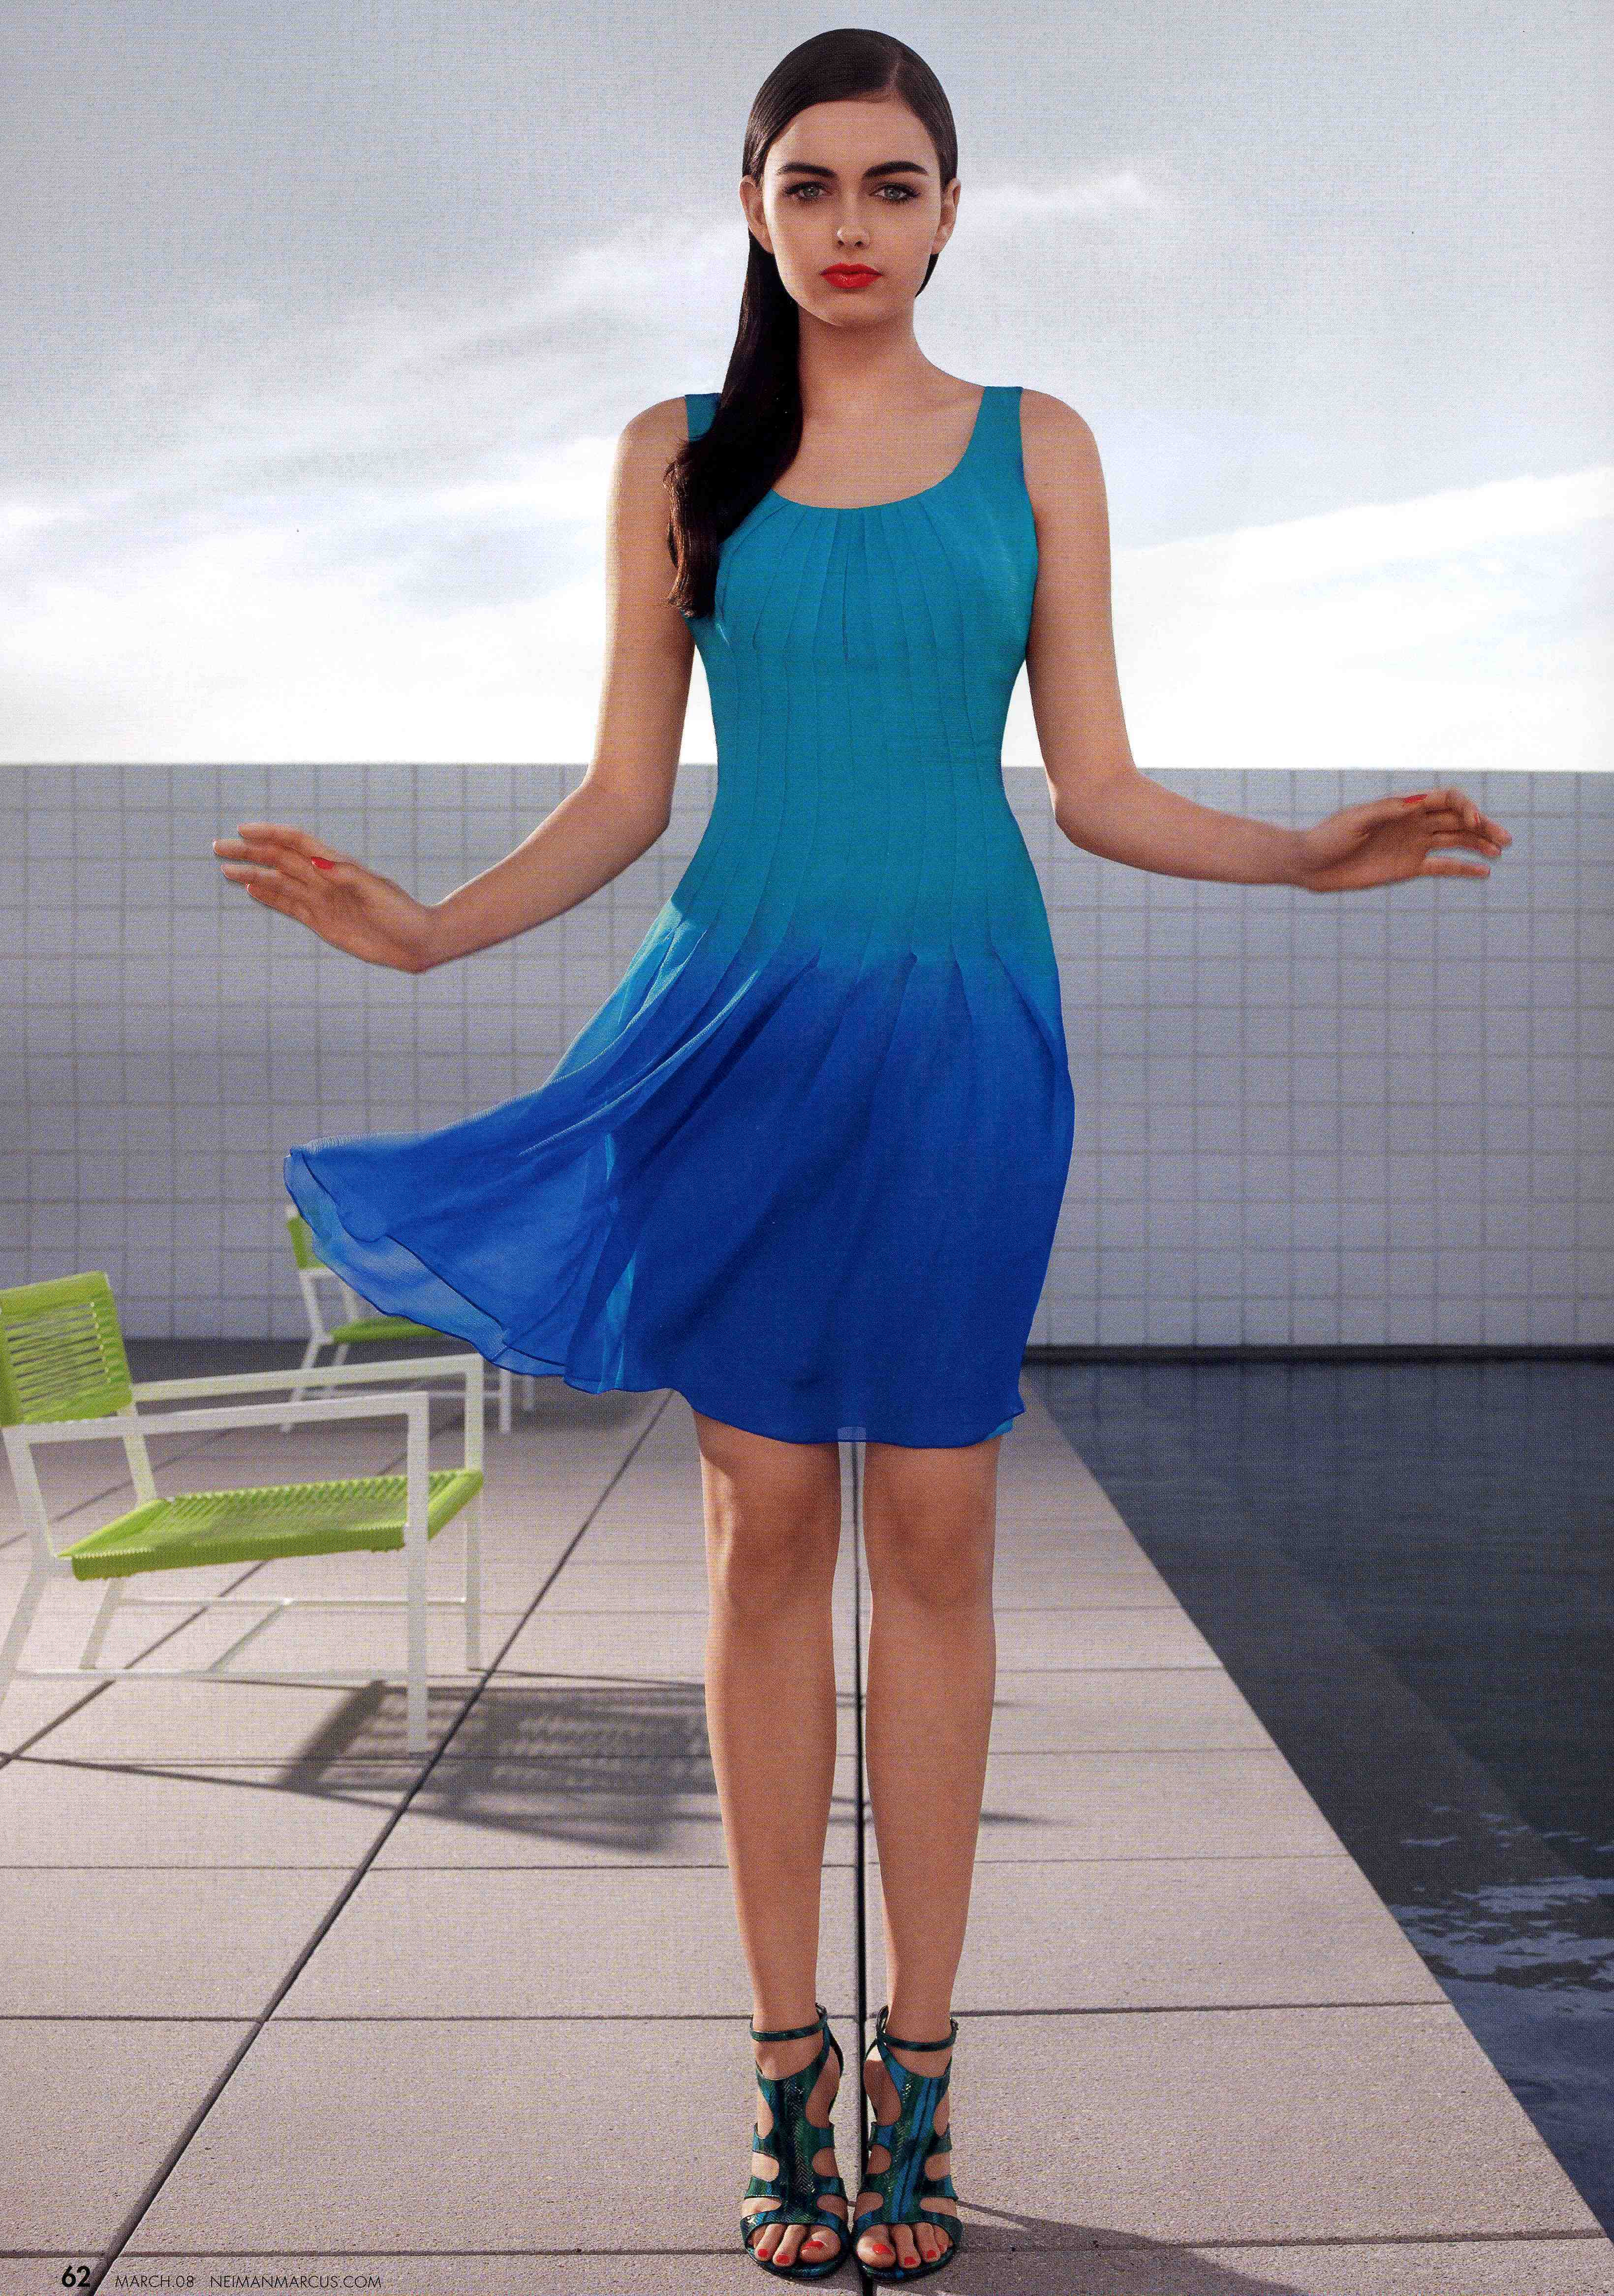 Feet Darla Baker nudes (77 foto and video), Tits, Leaked, Instagram, braless 2015